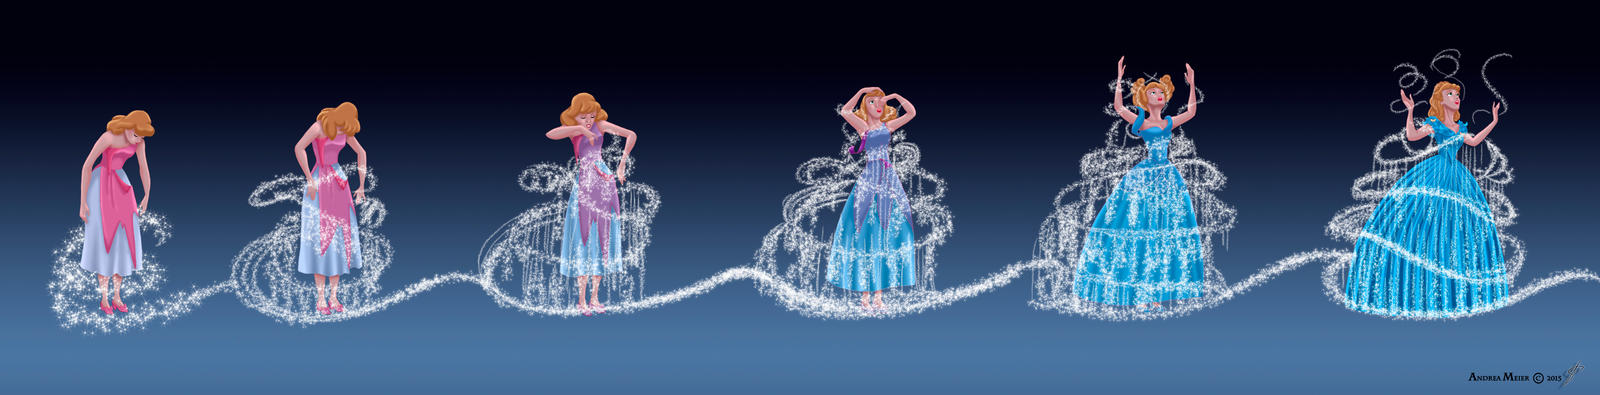 Cinderella 2015 - Bibbidi - Bobbidi - Boo by MissMikopete